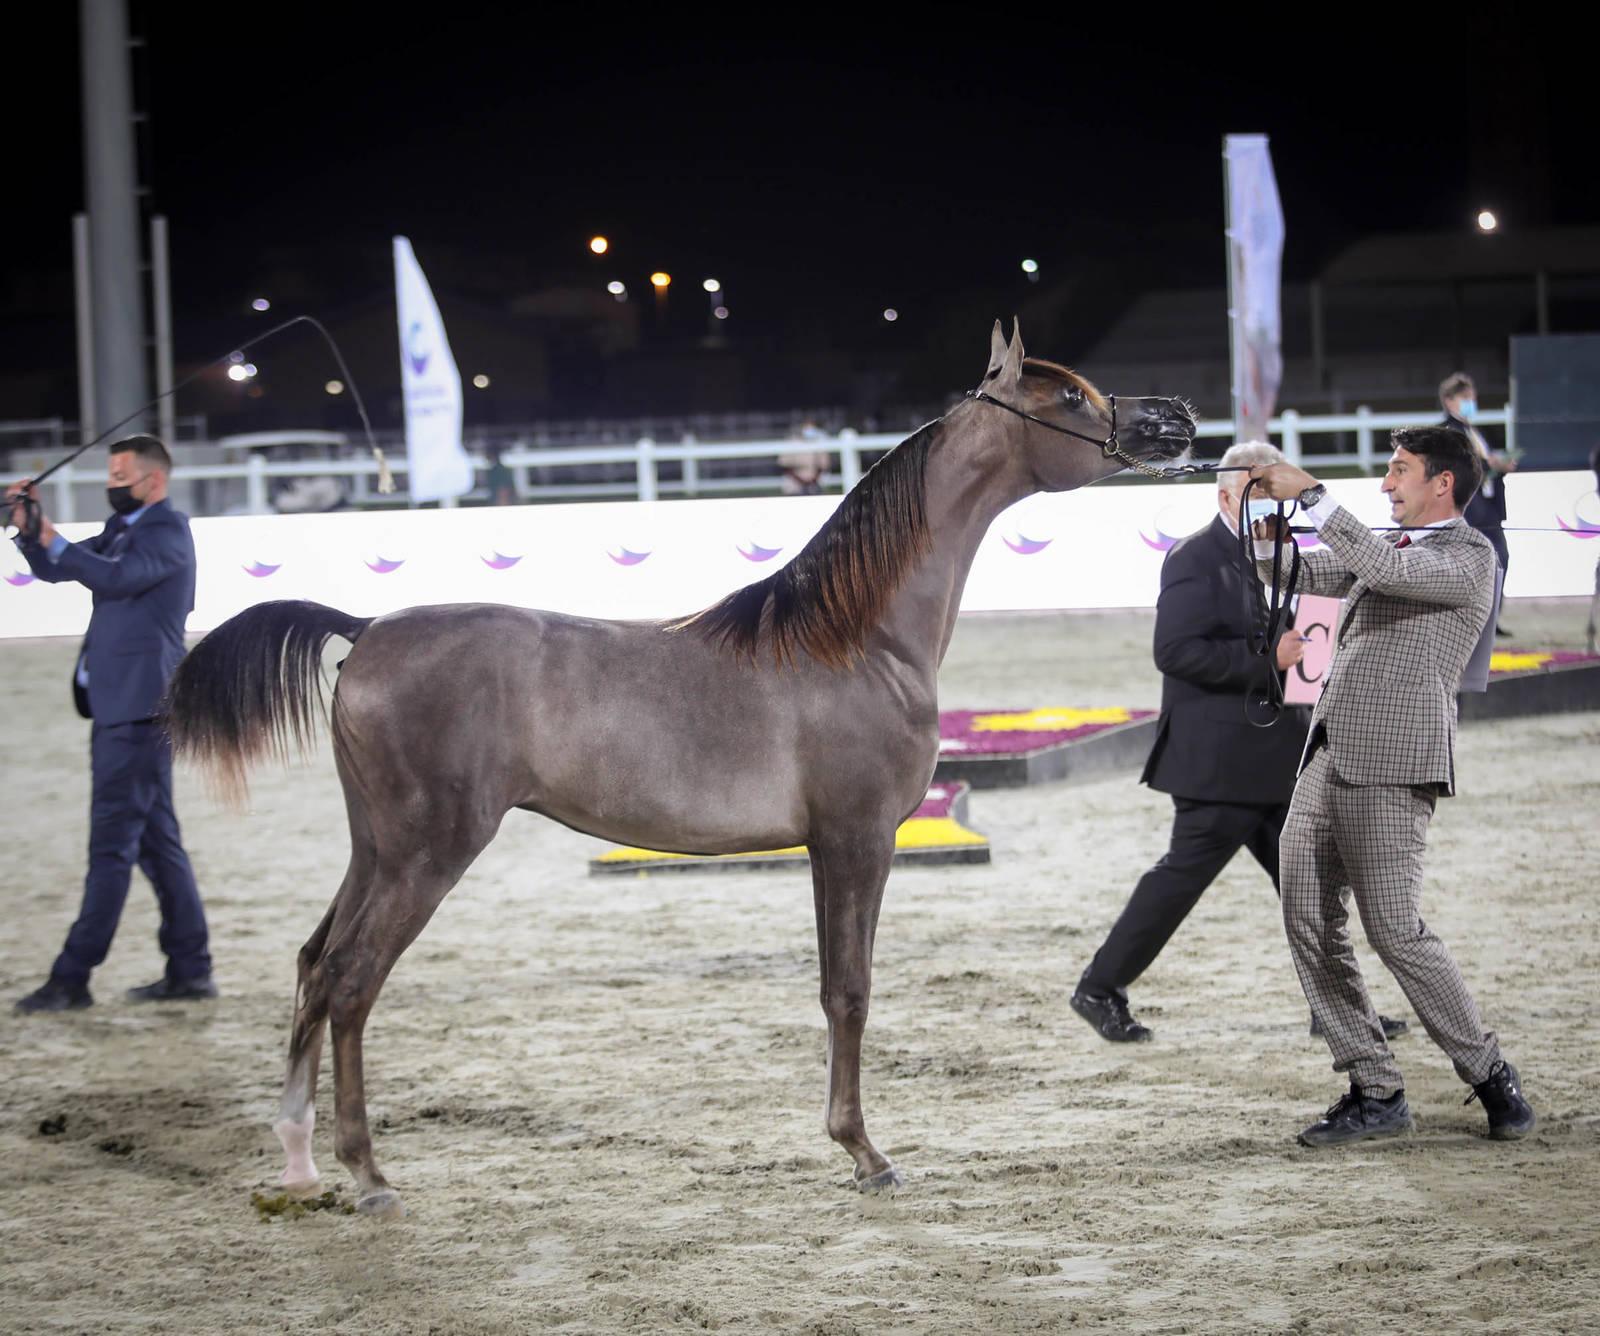 EMIRATES ARABIAN HORSE BREEDERS CHAMPIONSHIP 2021